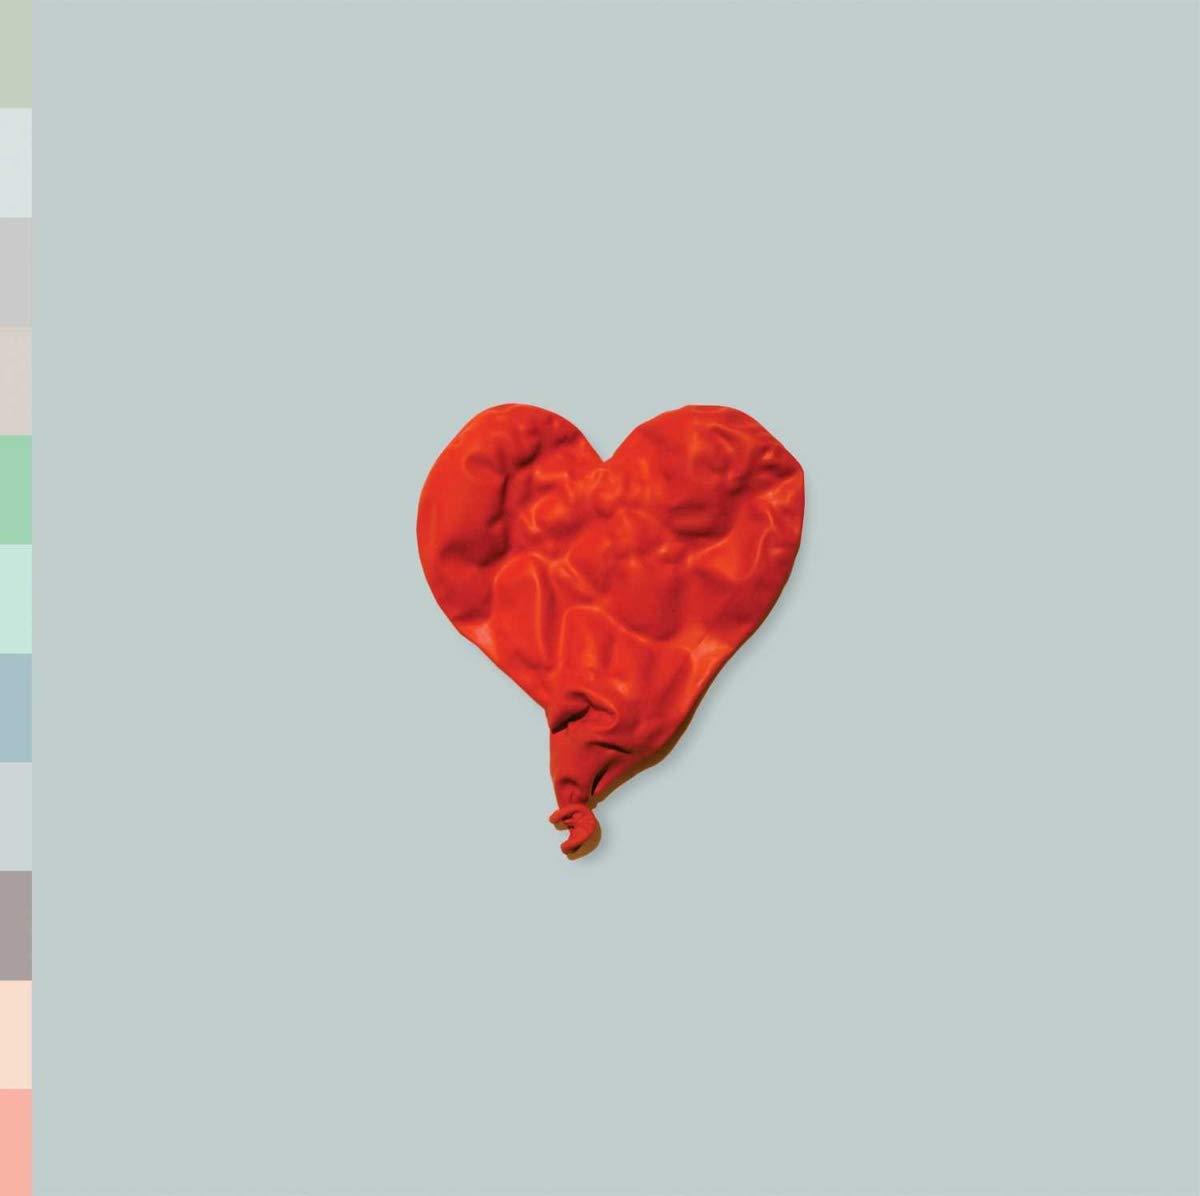 Kanye West - 808s & Heartbreak - Amazon.com Music